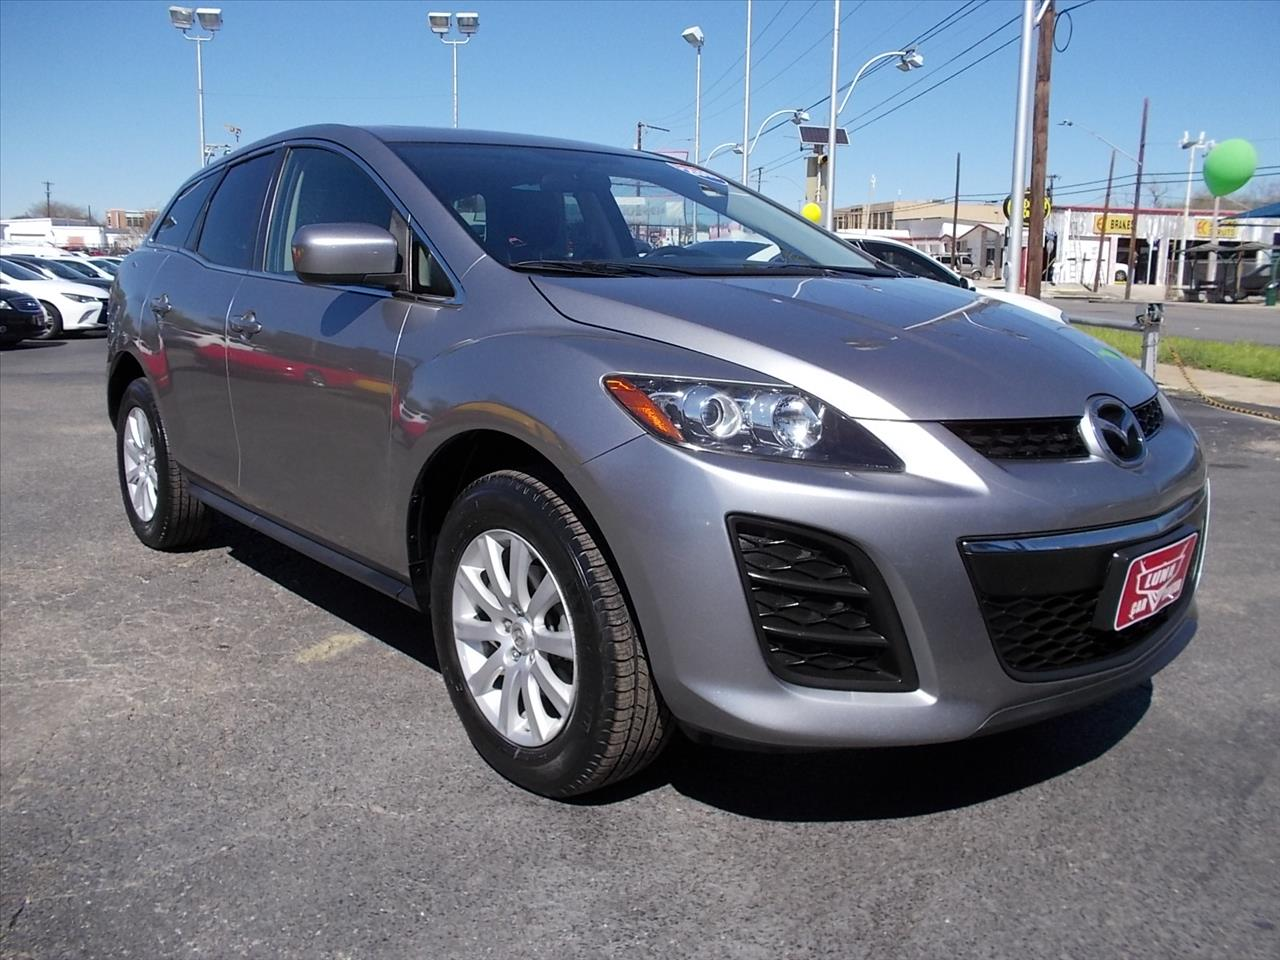 2010 Mazda Cx-7 i SV 4dr SUV In San Antonio TX - LUNA CAR ...